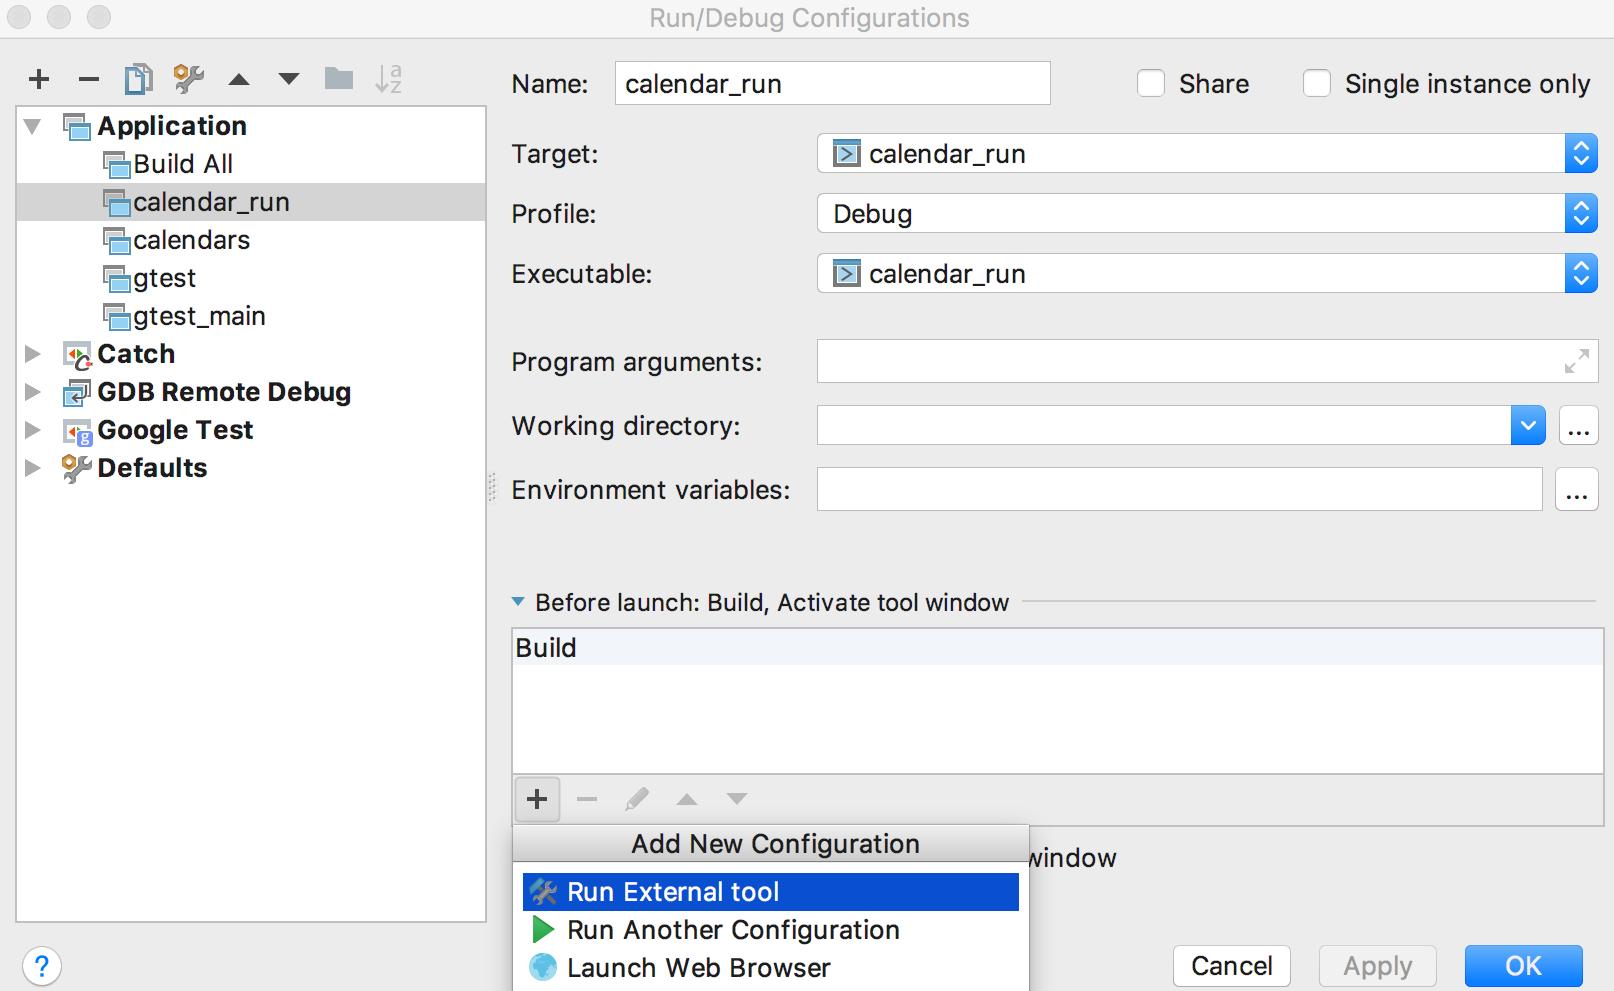 cl QST runDebugConfiguration